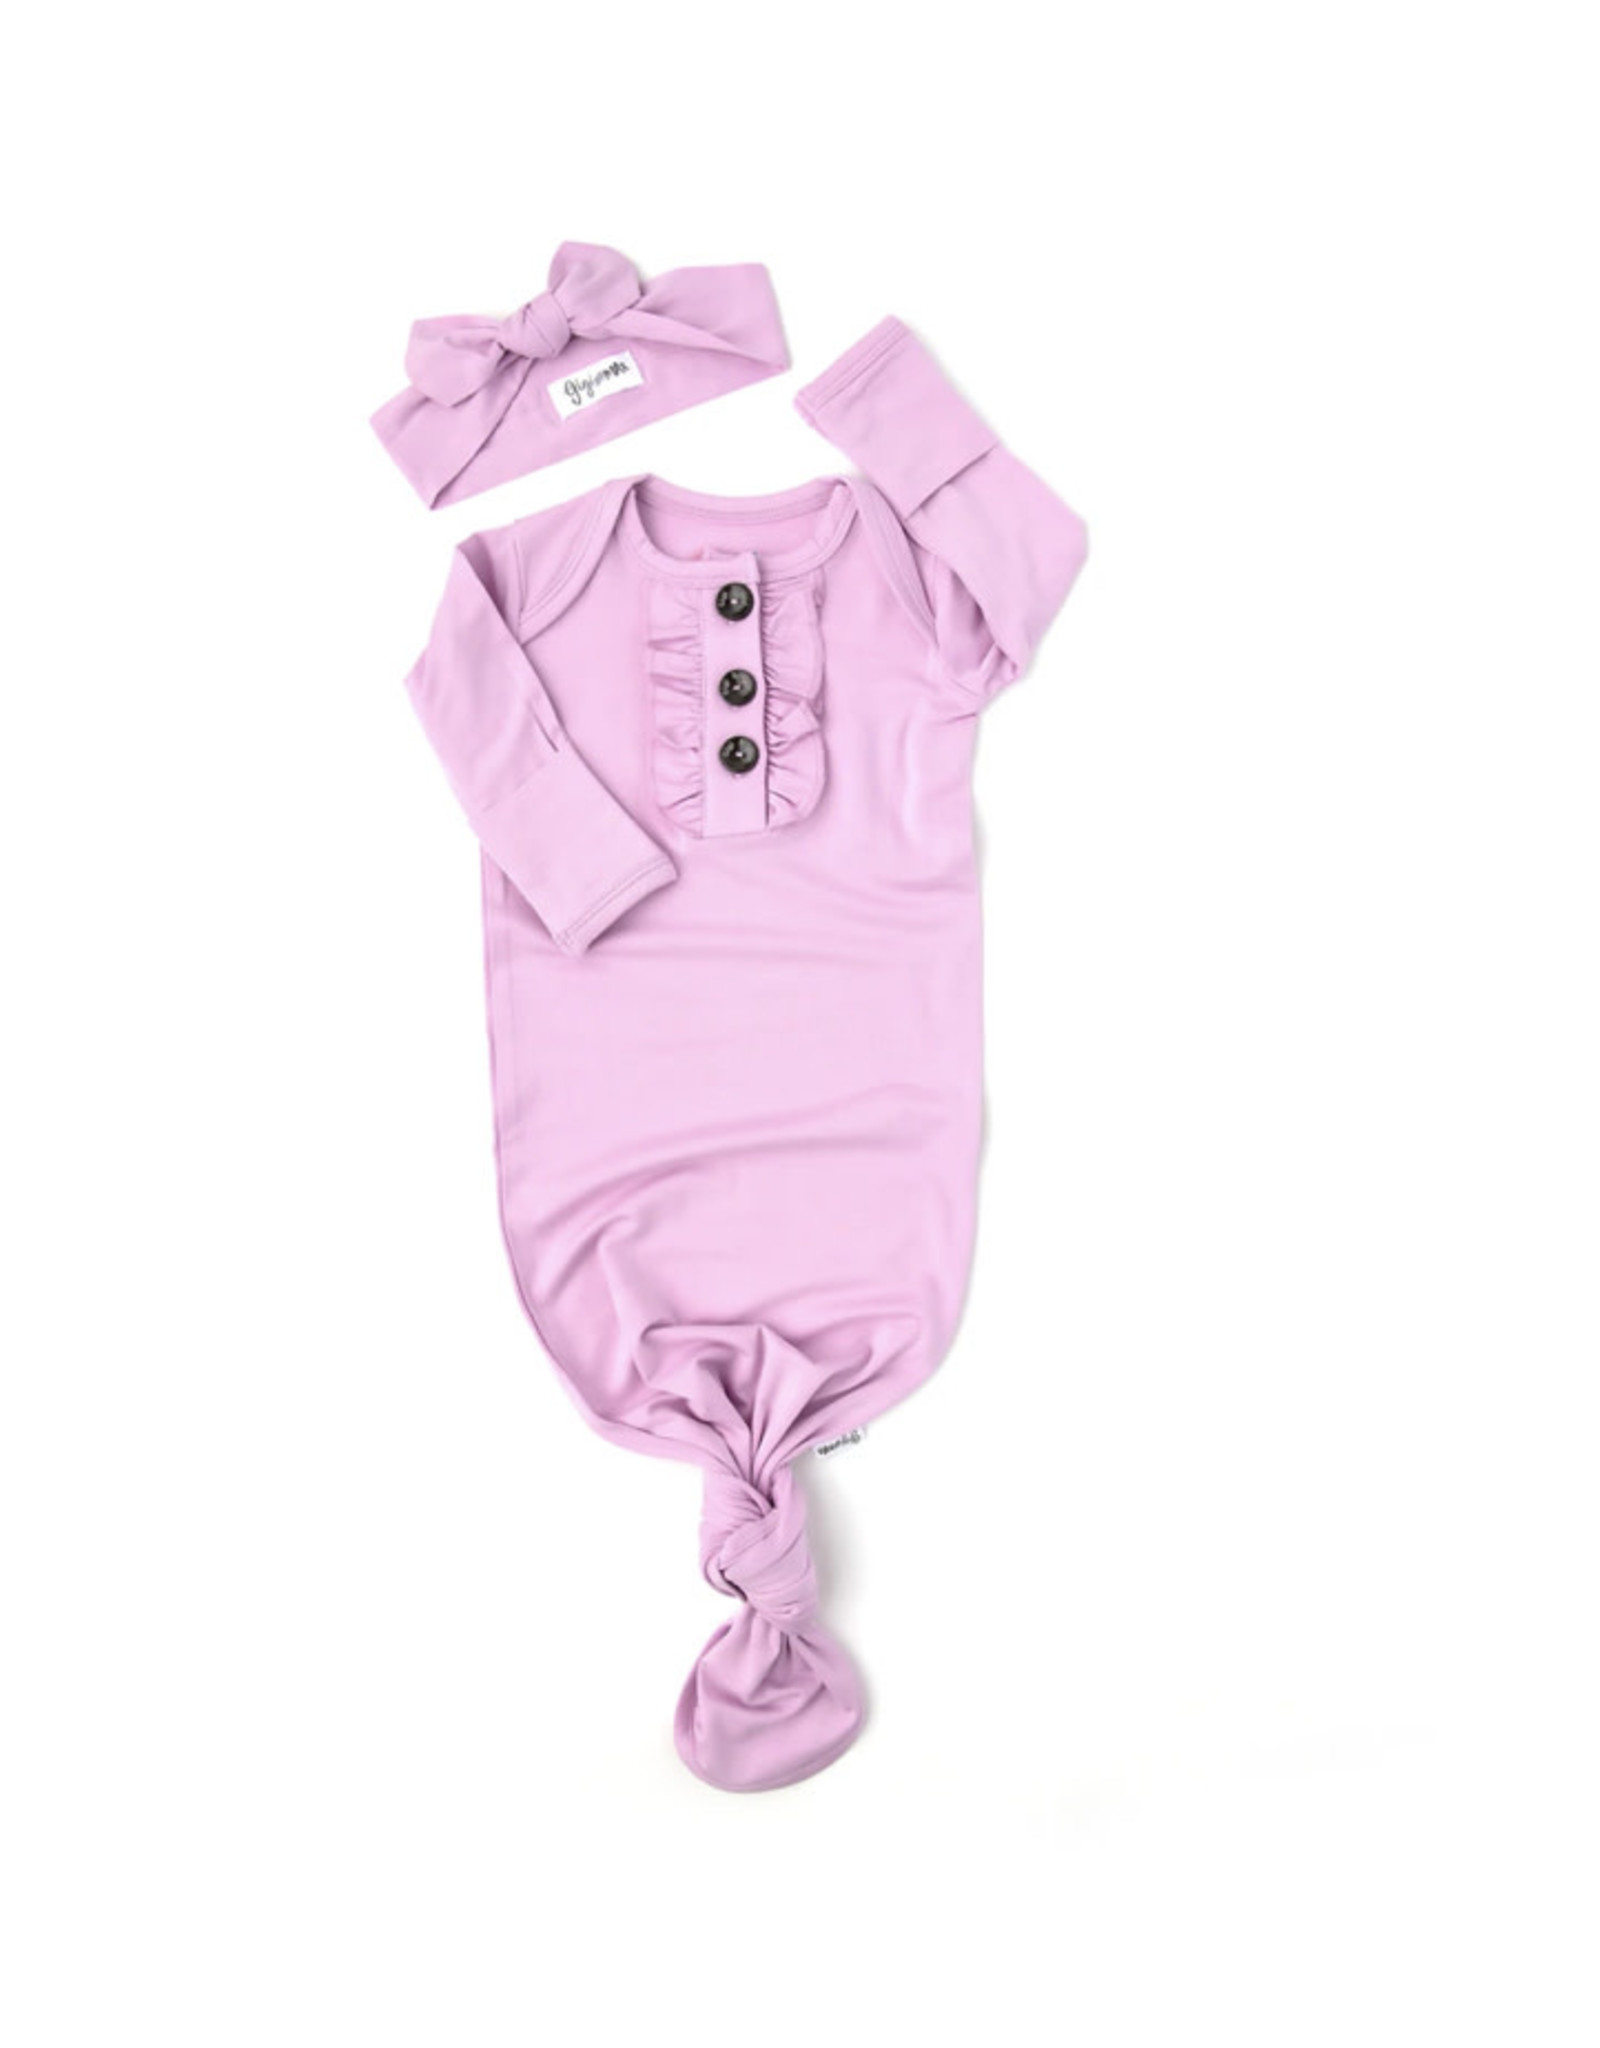 Gigi & Max Gigi & Max - Hailey Lavender Knotted Ruffle Button Gown & Headband Set